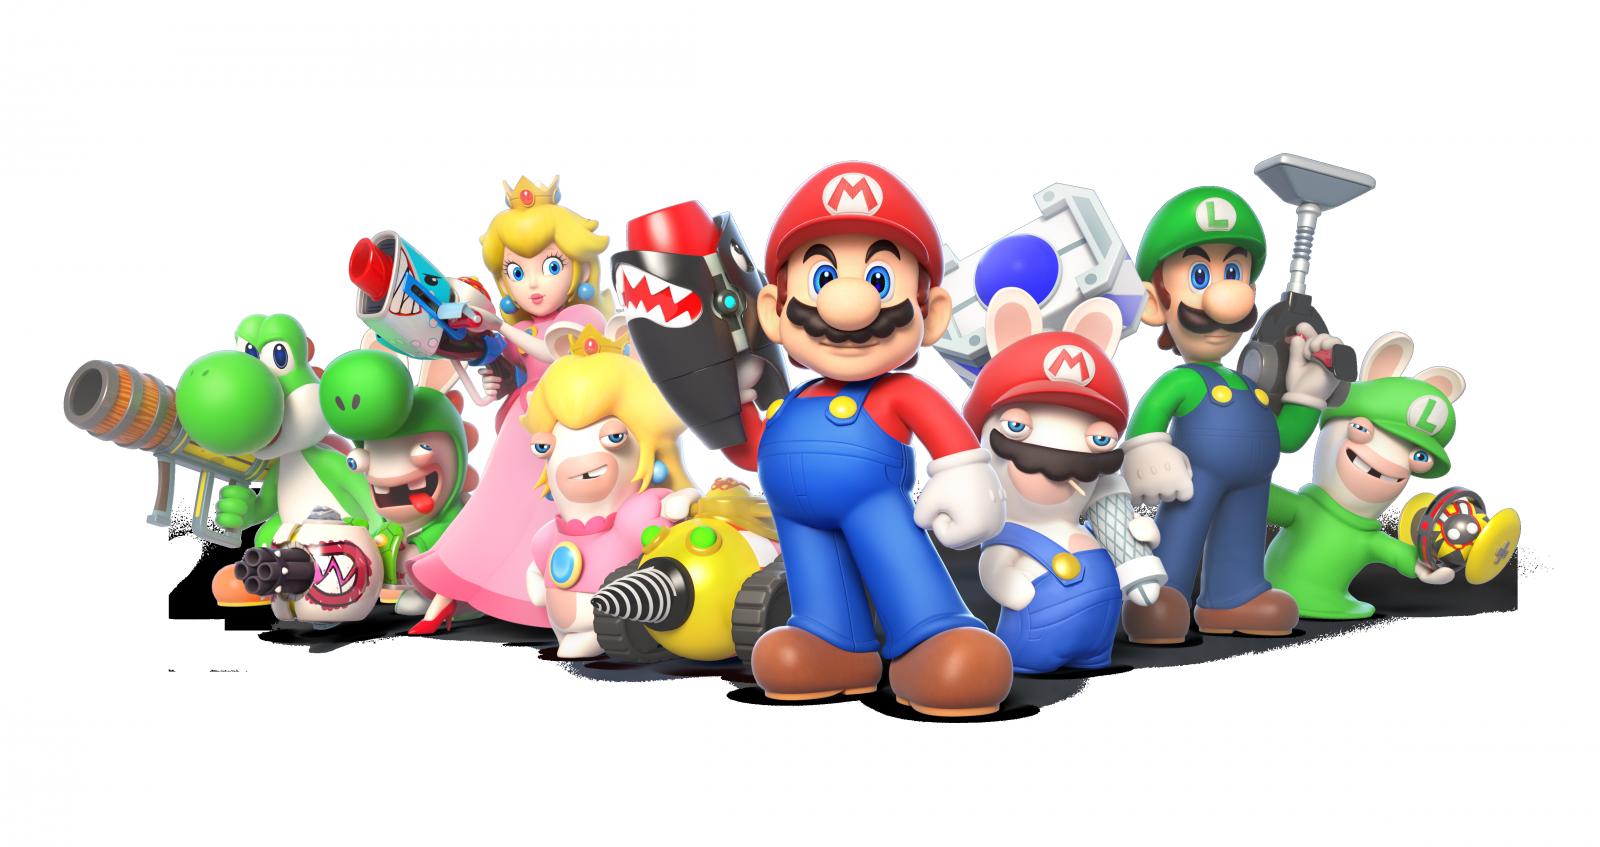 Mario + Rabbids: Kingdom Battle characters